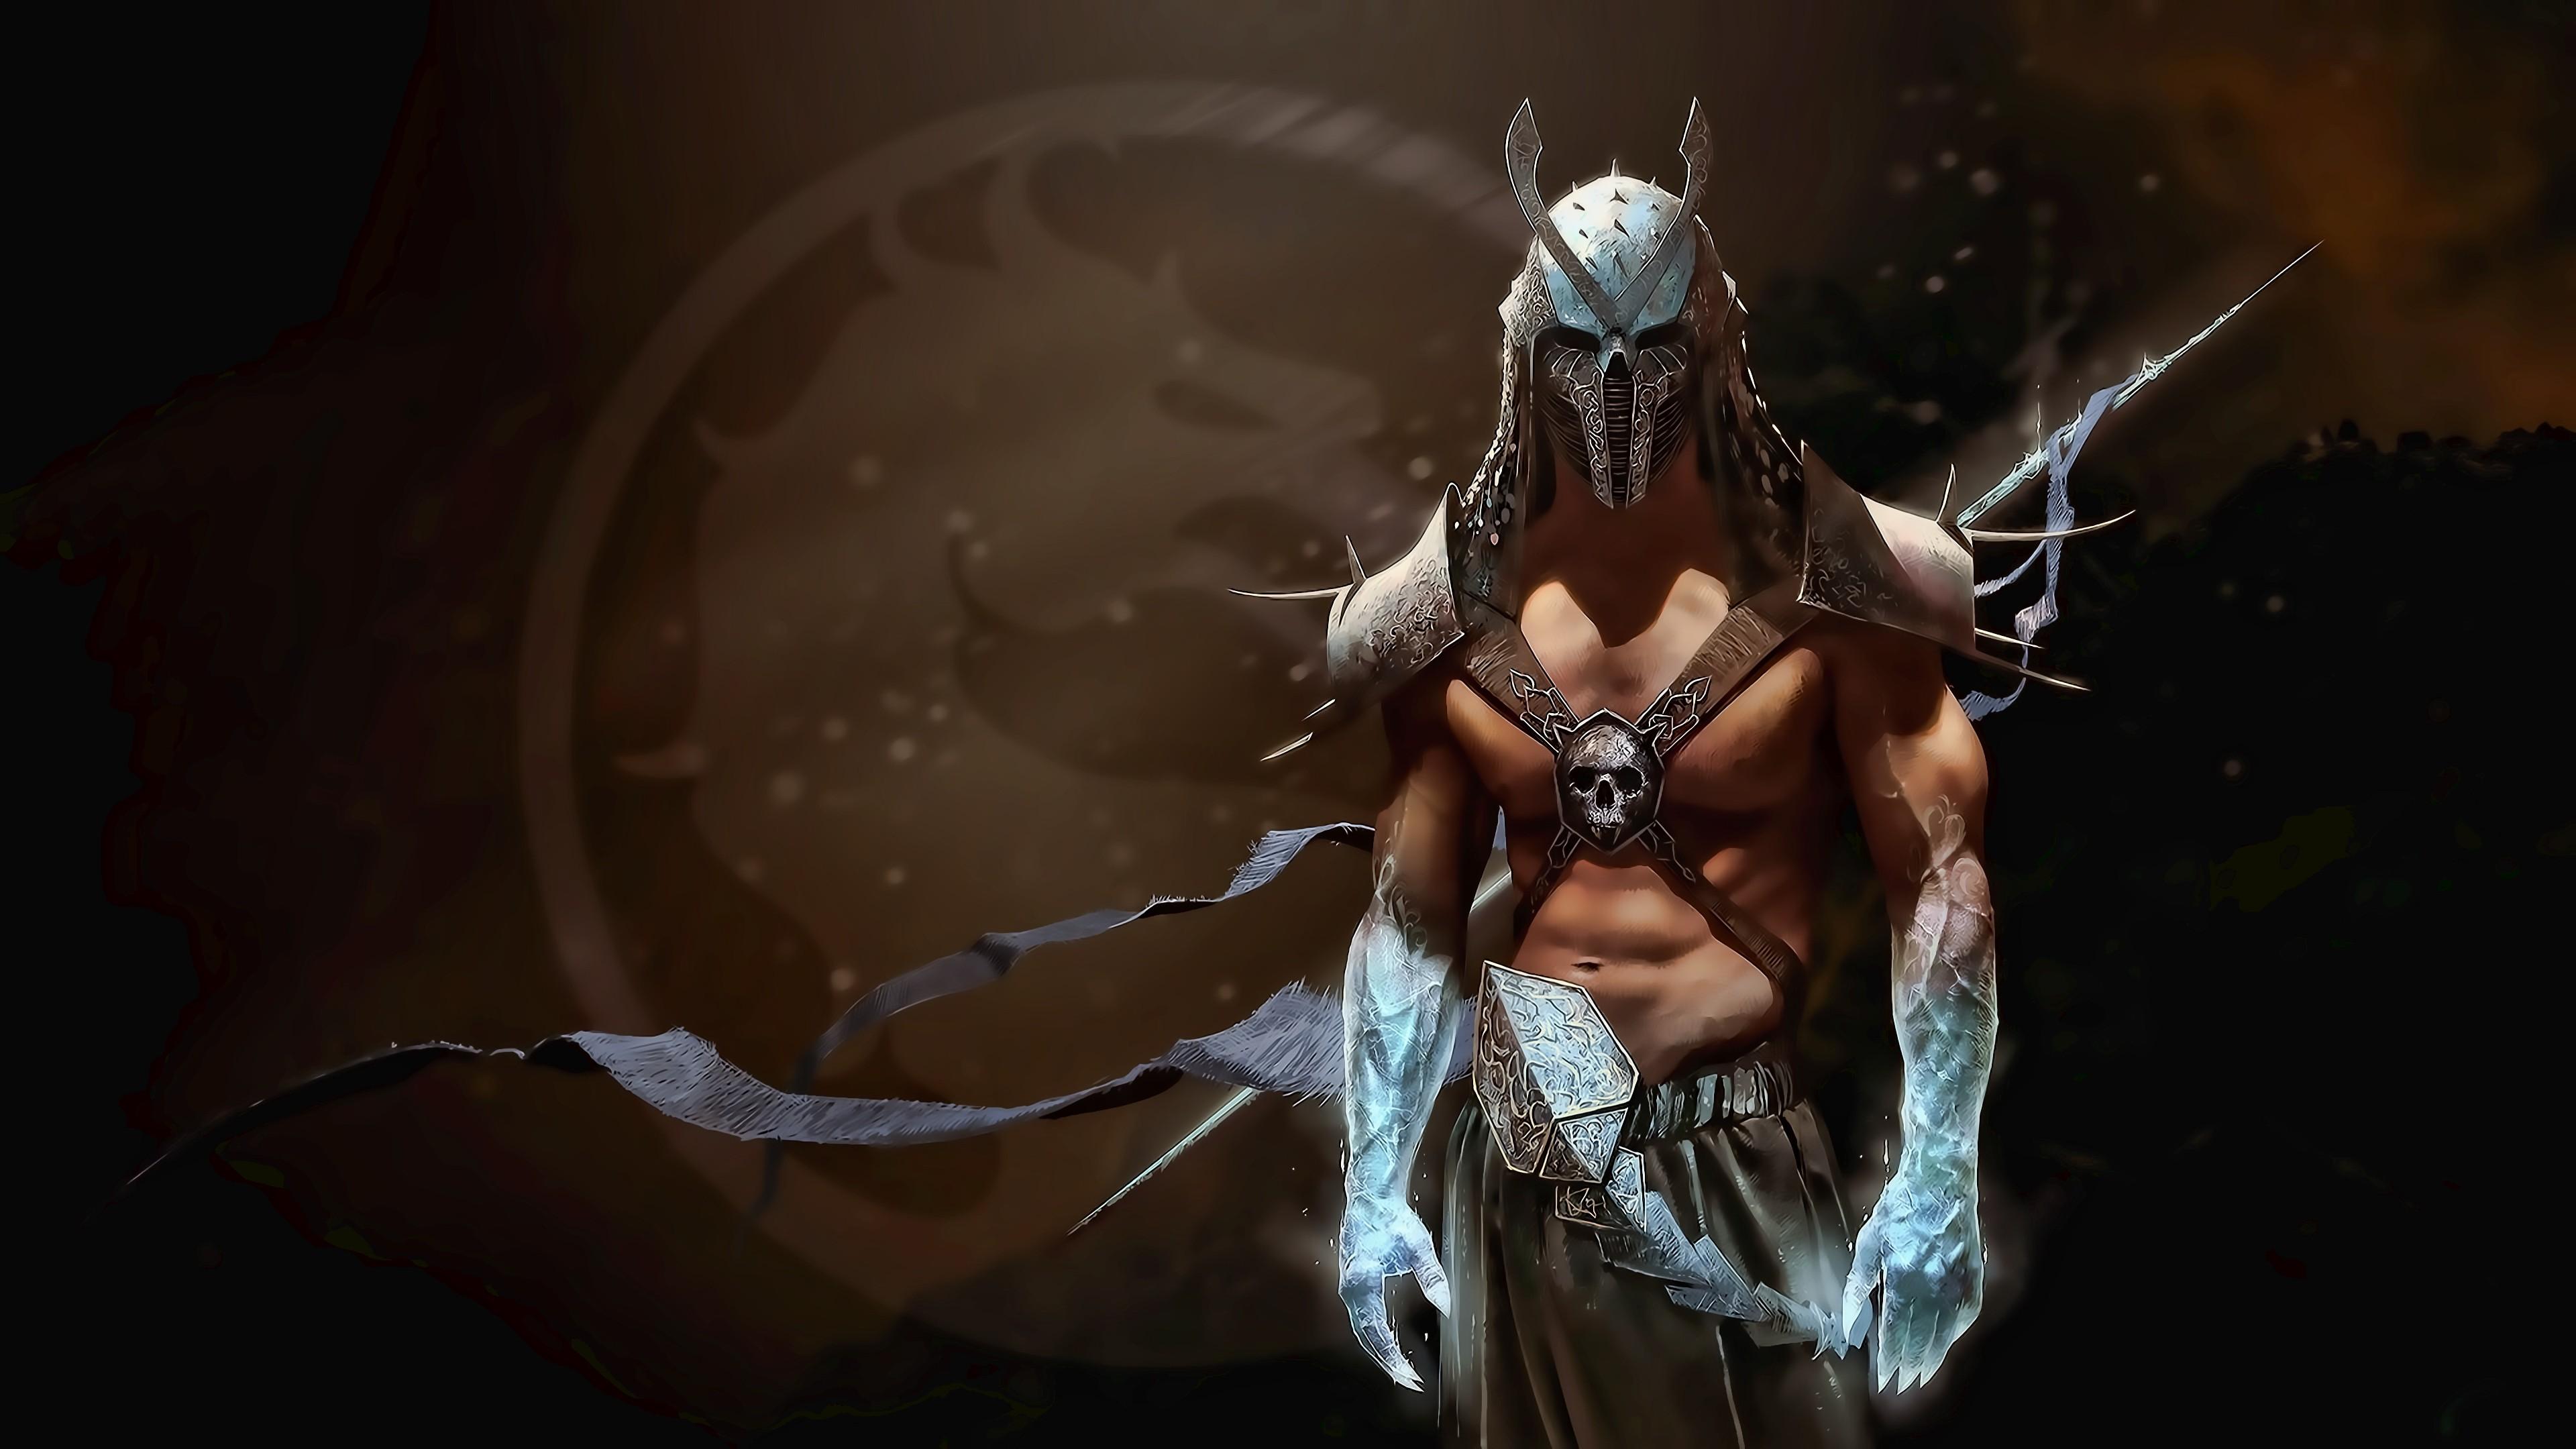 Mk11 Wallpaper: Shao Kahn Mortal Kombat, HD Games, 4k Wallpapers, Images